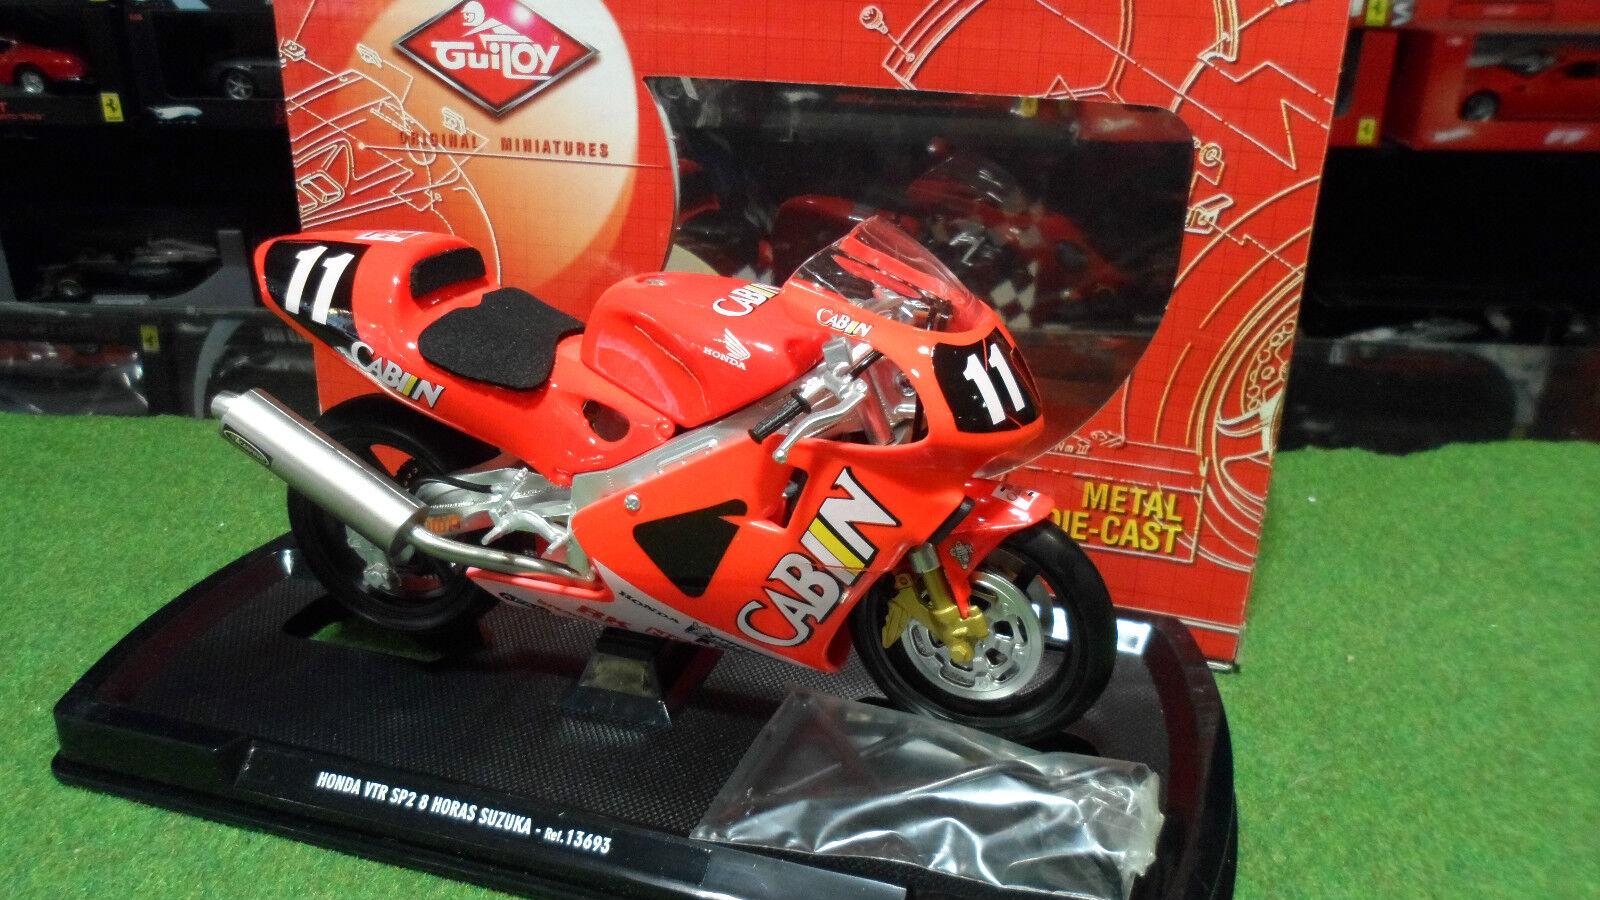 MOTO HONDA VTR SP2 8 8 8 HORAS SUZUKA   11 1 10 GUILOY 13693 miniature de collection 2c79f5